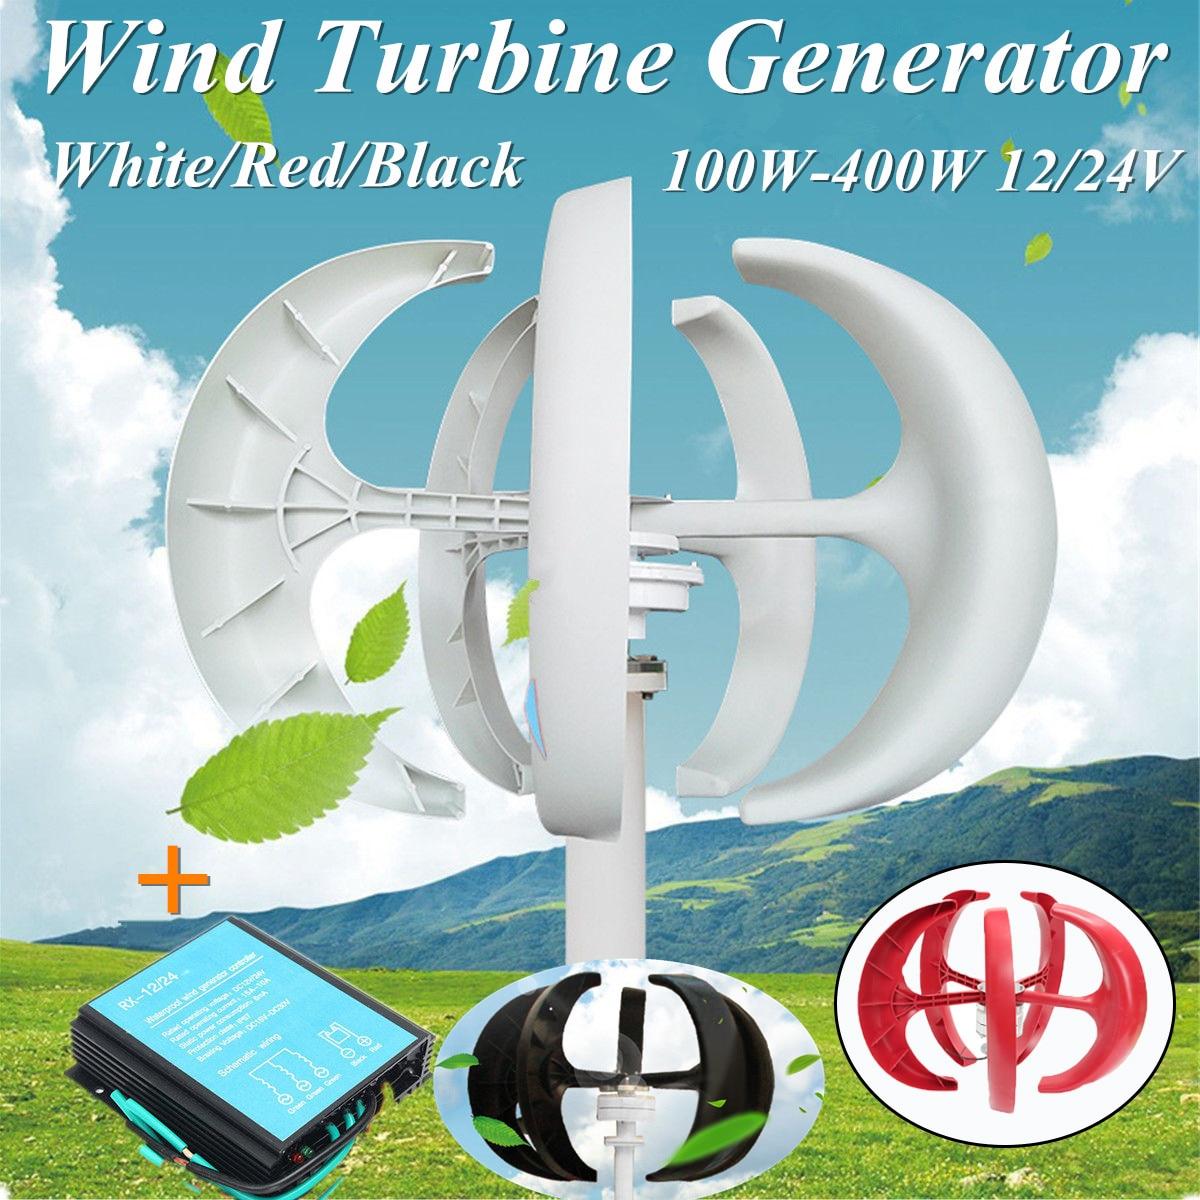 100W 200W 300W 400W Wind Generator Lantern 12V/24V 5 Blades Permanent Magnet Generator Turbine 600W Wind Controller 12V/24V 100w 200w 300w 400w lantern wind turbine generator dc 12v 24v wind power permanent magnet generator 600w wind energy controller